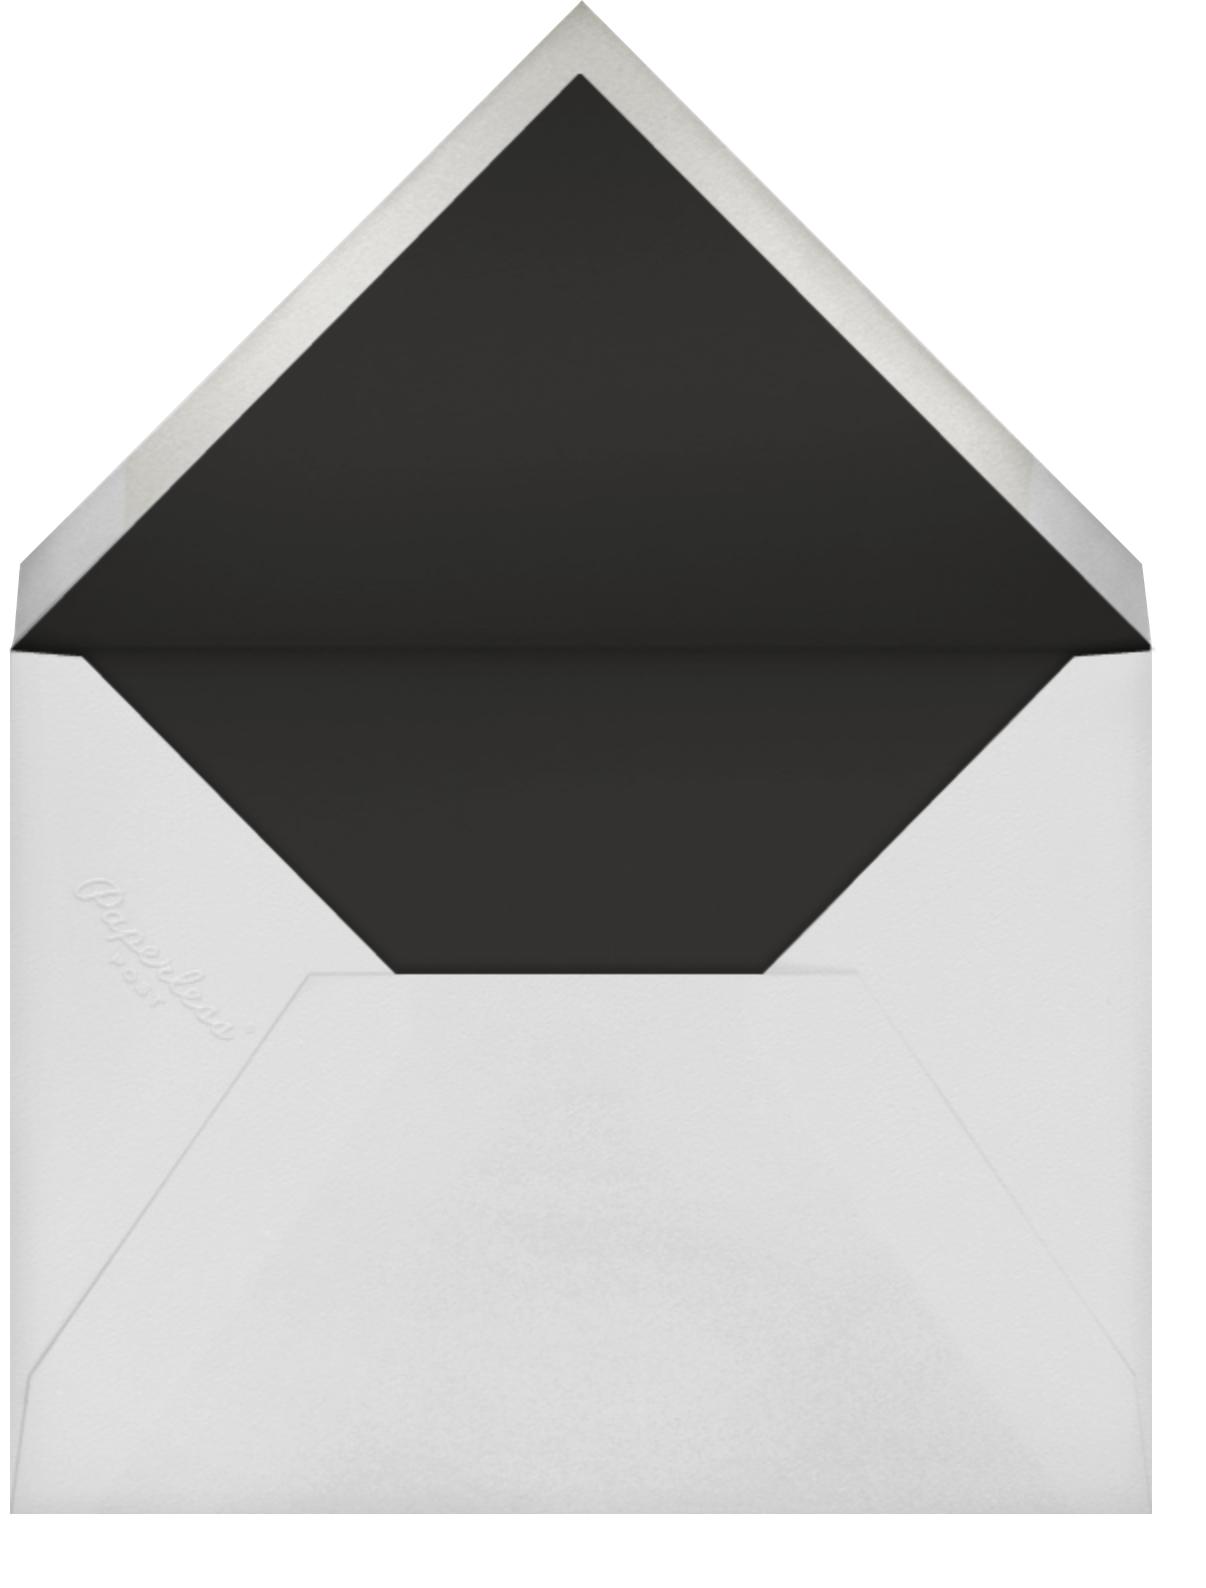 Splatter Cloth I (Invitation) - Gold - Paperless Post - Charity and fundraiser  - envelope back